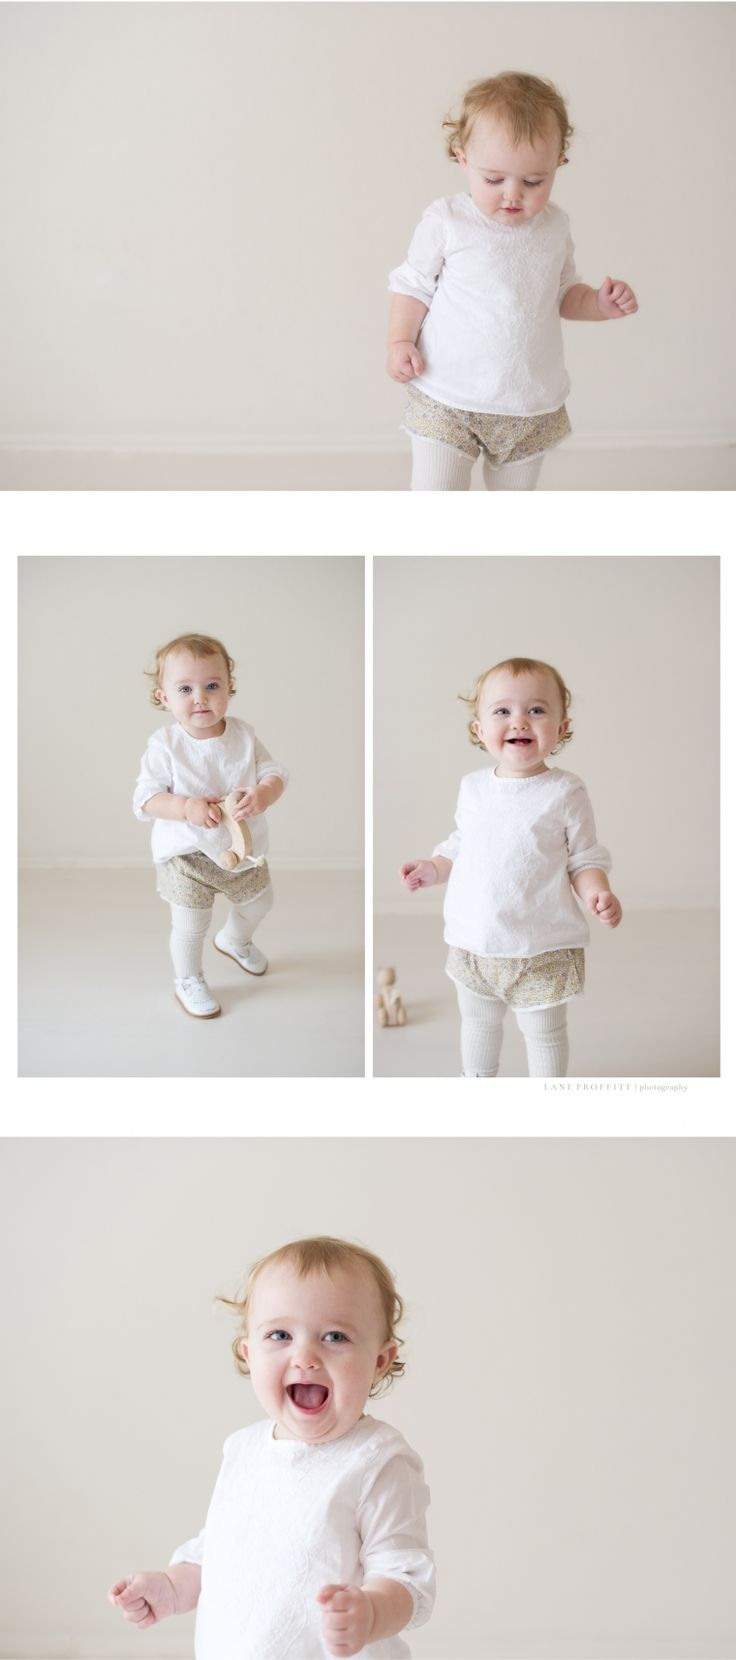 Toddler//  studio Dallas Baby Photographer Copyright Lane Proffitt Photography